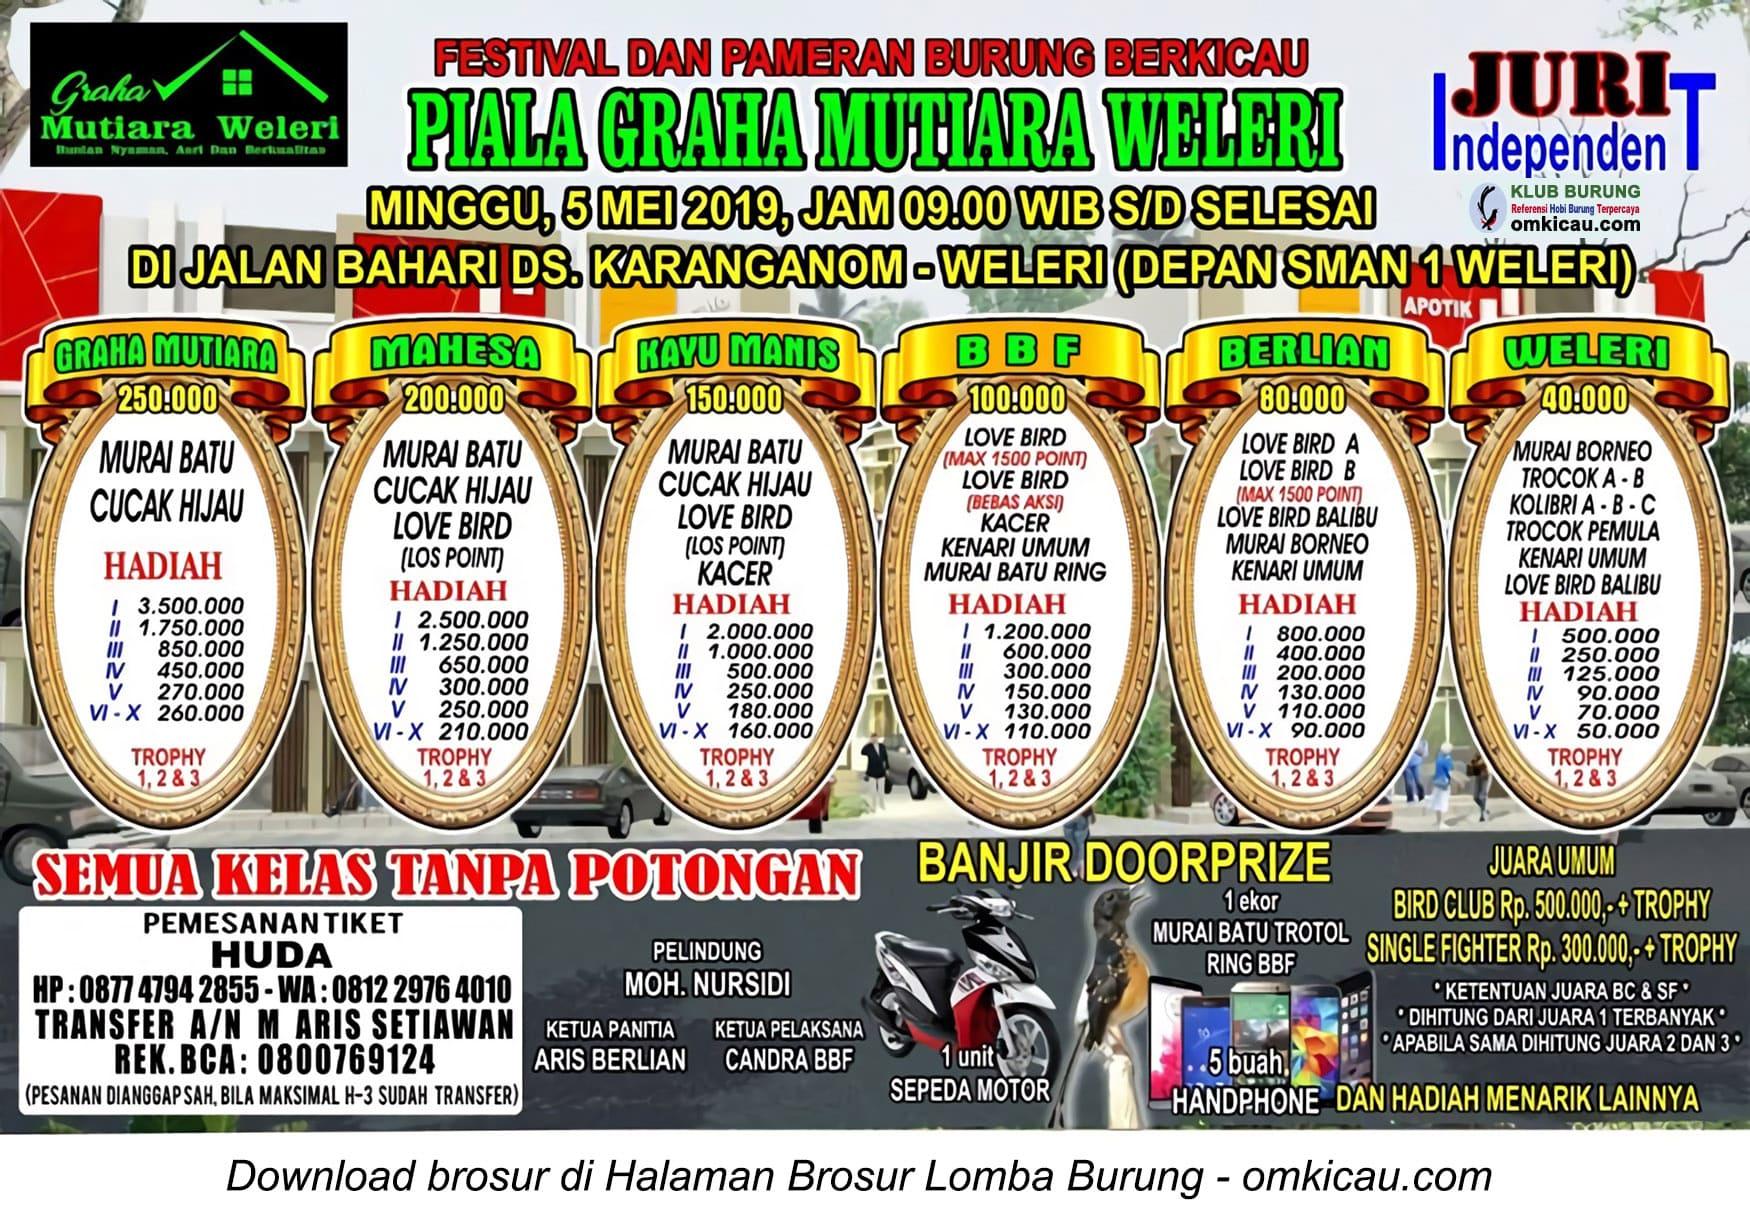 Piala Graha Mutiara Weleri